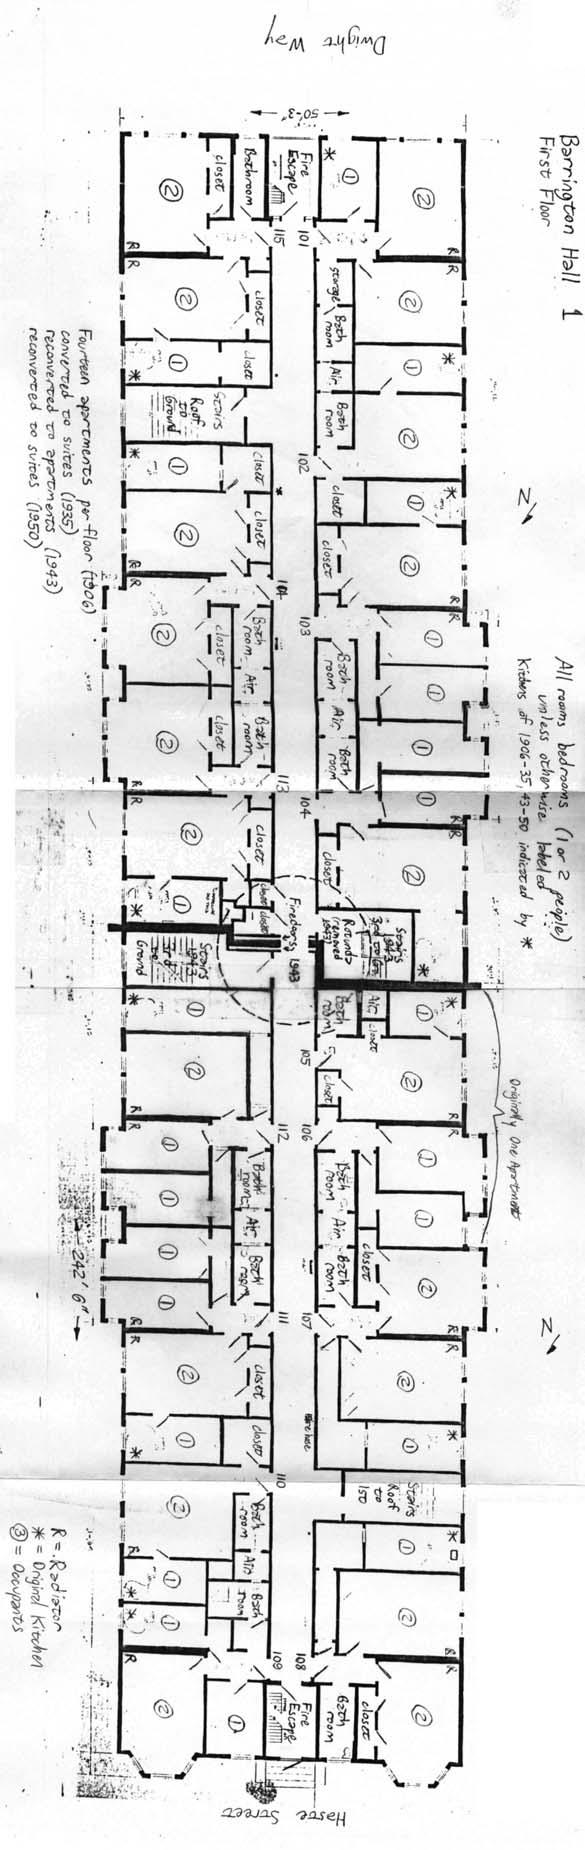 image from http rlv zcache com au image from http rlv zcache com au vasily polenov sketch floor plan of trinity church postcard r0a2e68df17ac4ef78fa31d144c6803a6 vgbaq 8byvr 324 j